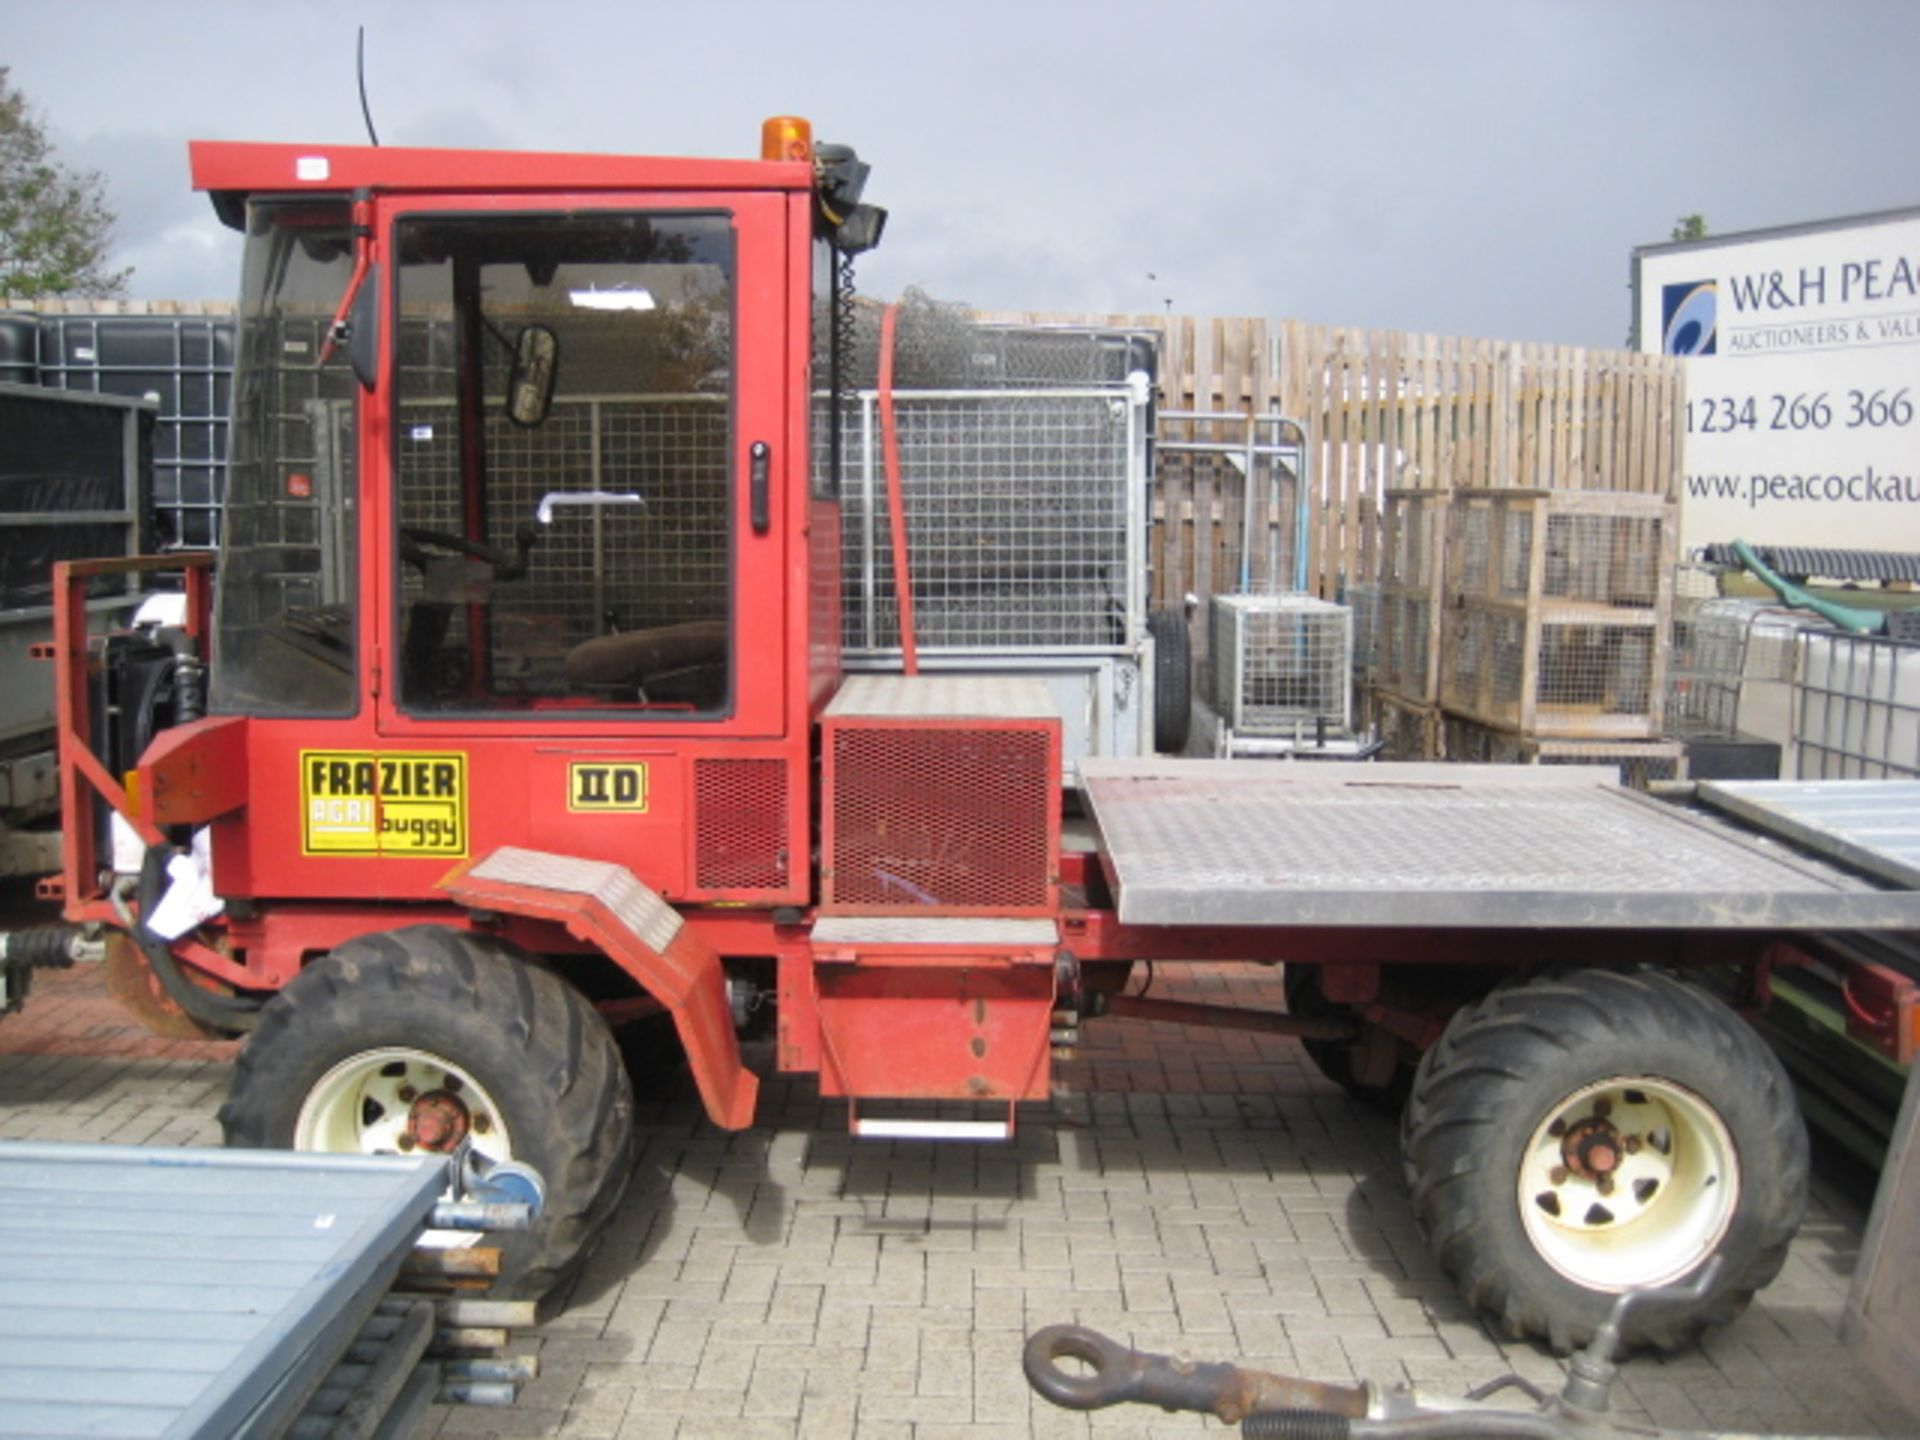 Lot 4022 - Frazier 4x4 IID Agribuggy Model 2D197, 1753cc Ford Endura-DE diesel engine, PTO, checkerplate rear